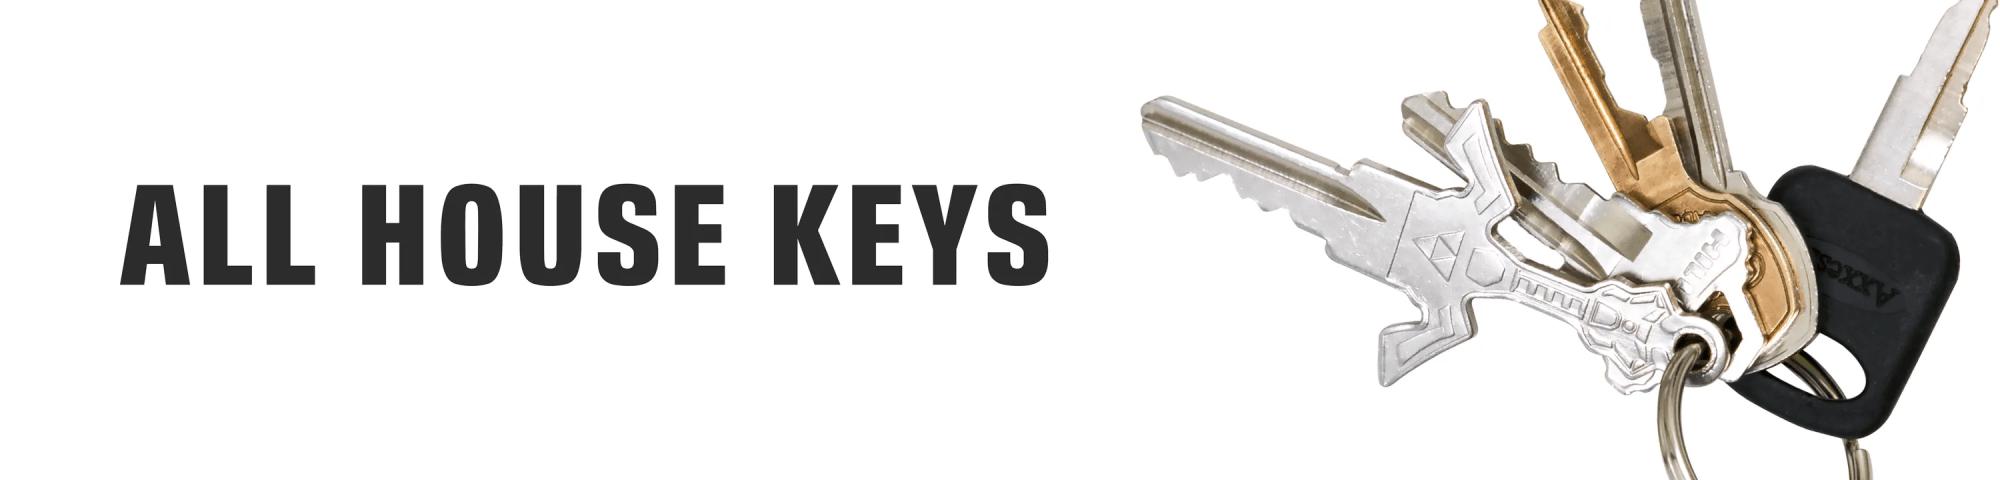 hight resolution of house keys